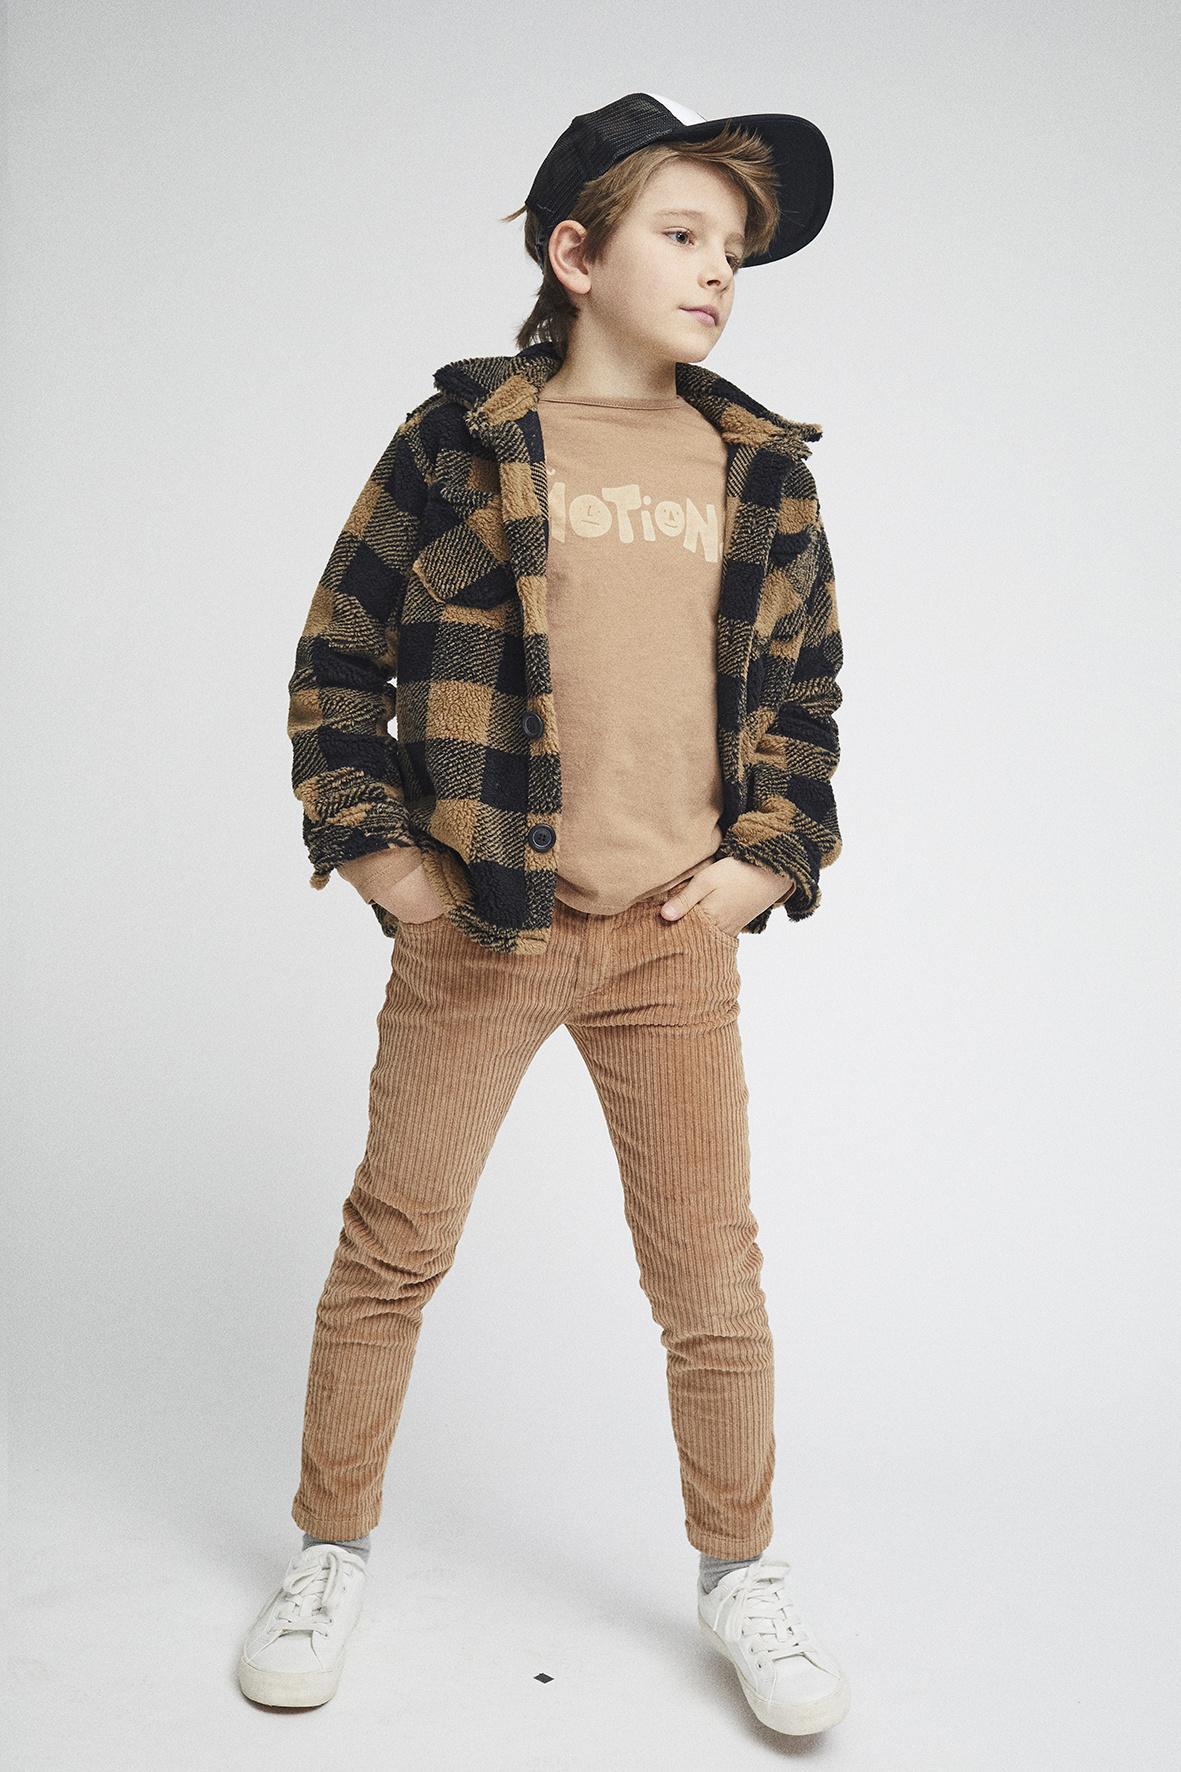 Pinata Pum Shirt Over Shirt Brown Square